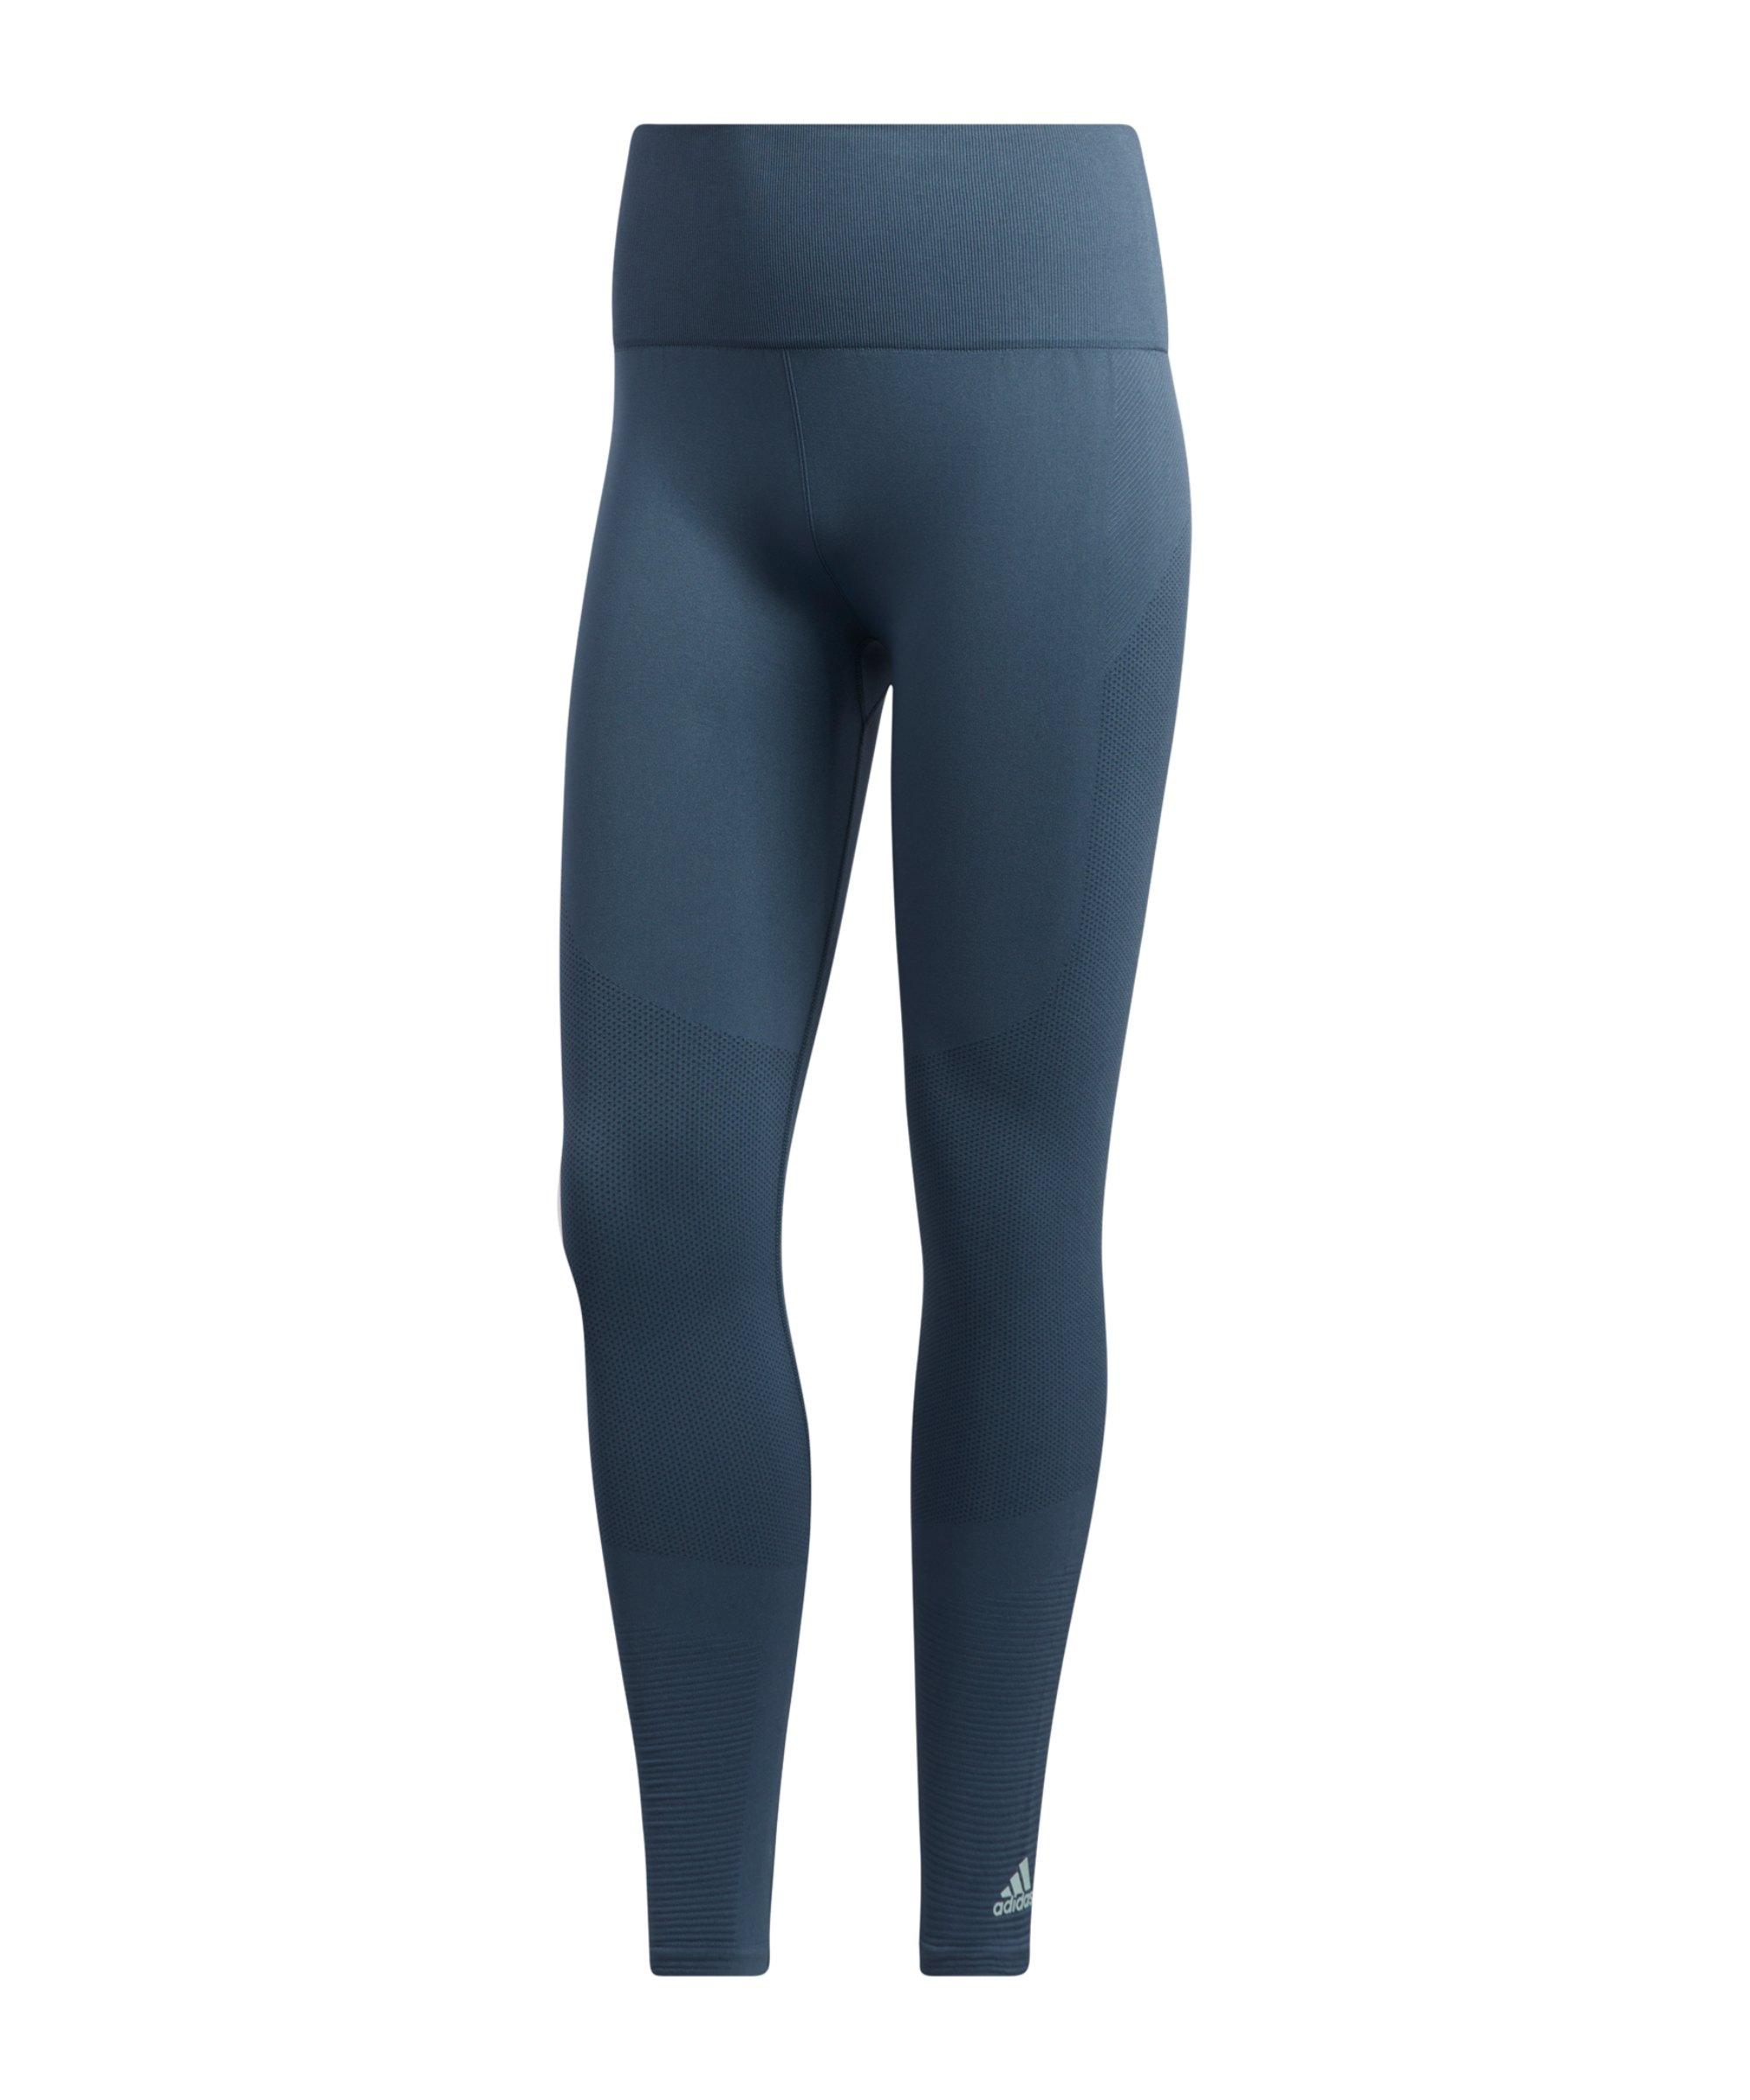 adidas Seamless Leggings Running Damen Blau - blau